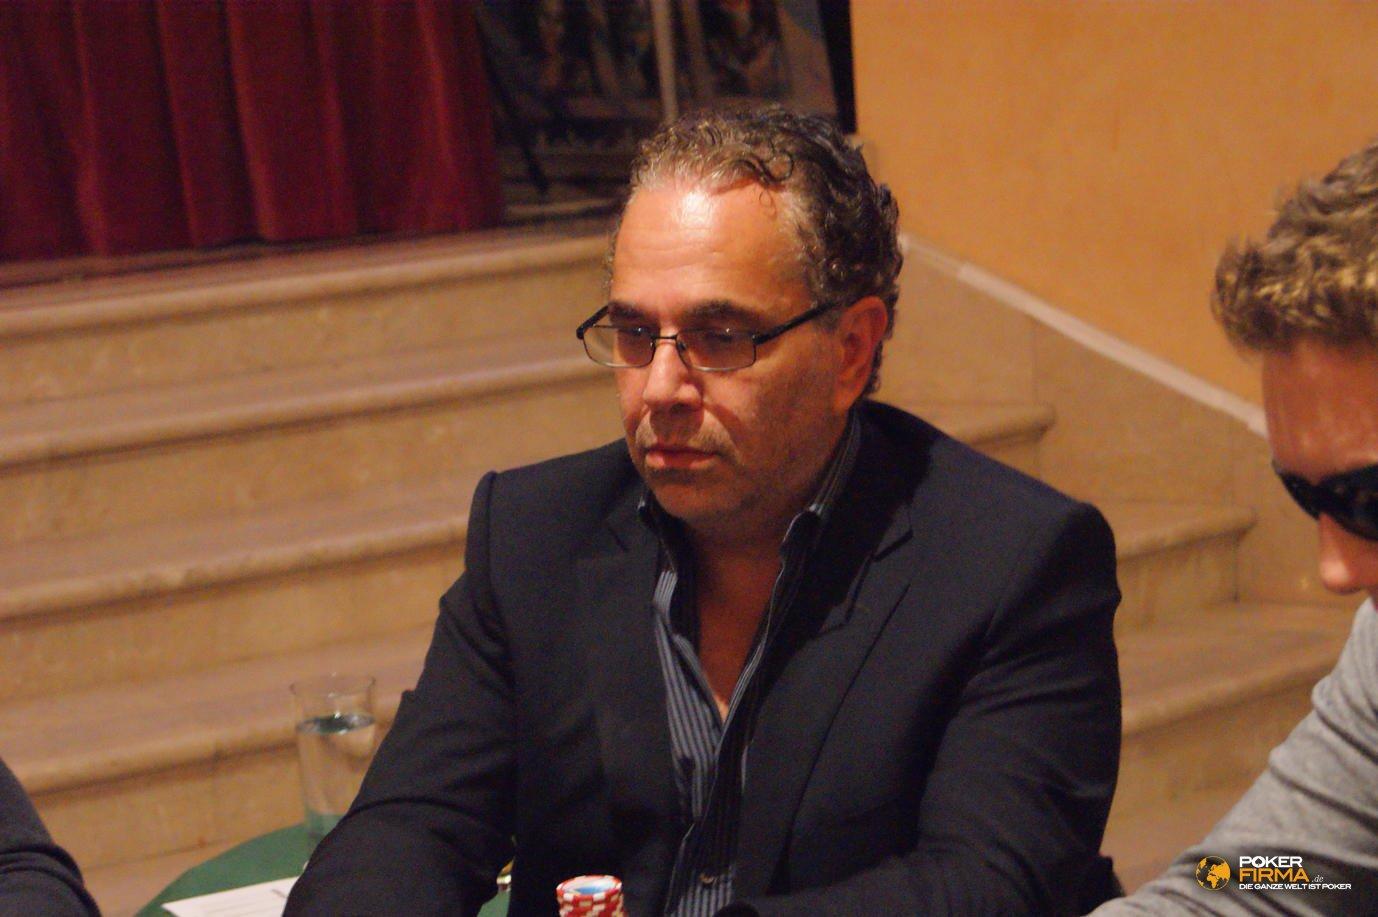 Poker_EM_2000_NLH_251011_Samy_Albeck